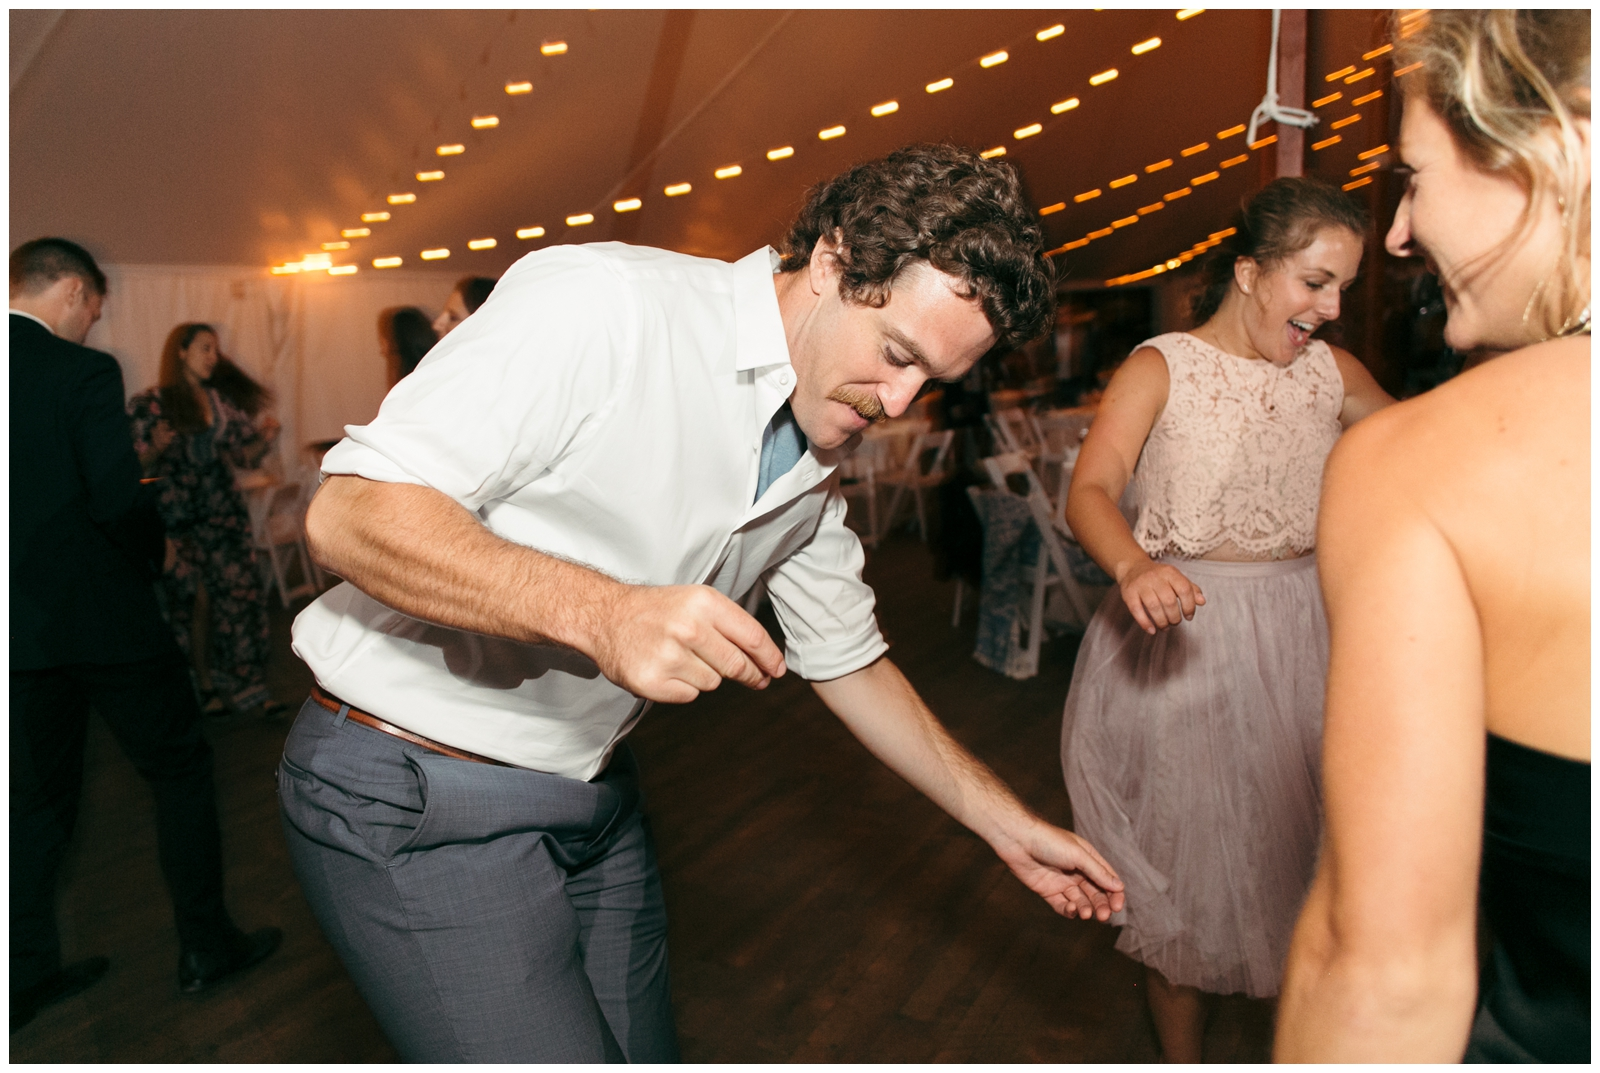 Moraine-Farm-wedding-Bailey-Q-Photo-Massachusetts-wedding-photpgrapher-141.jpg